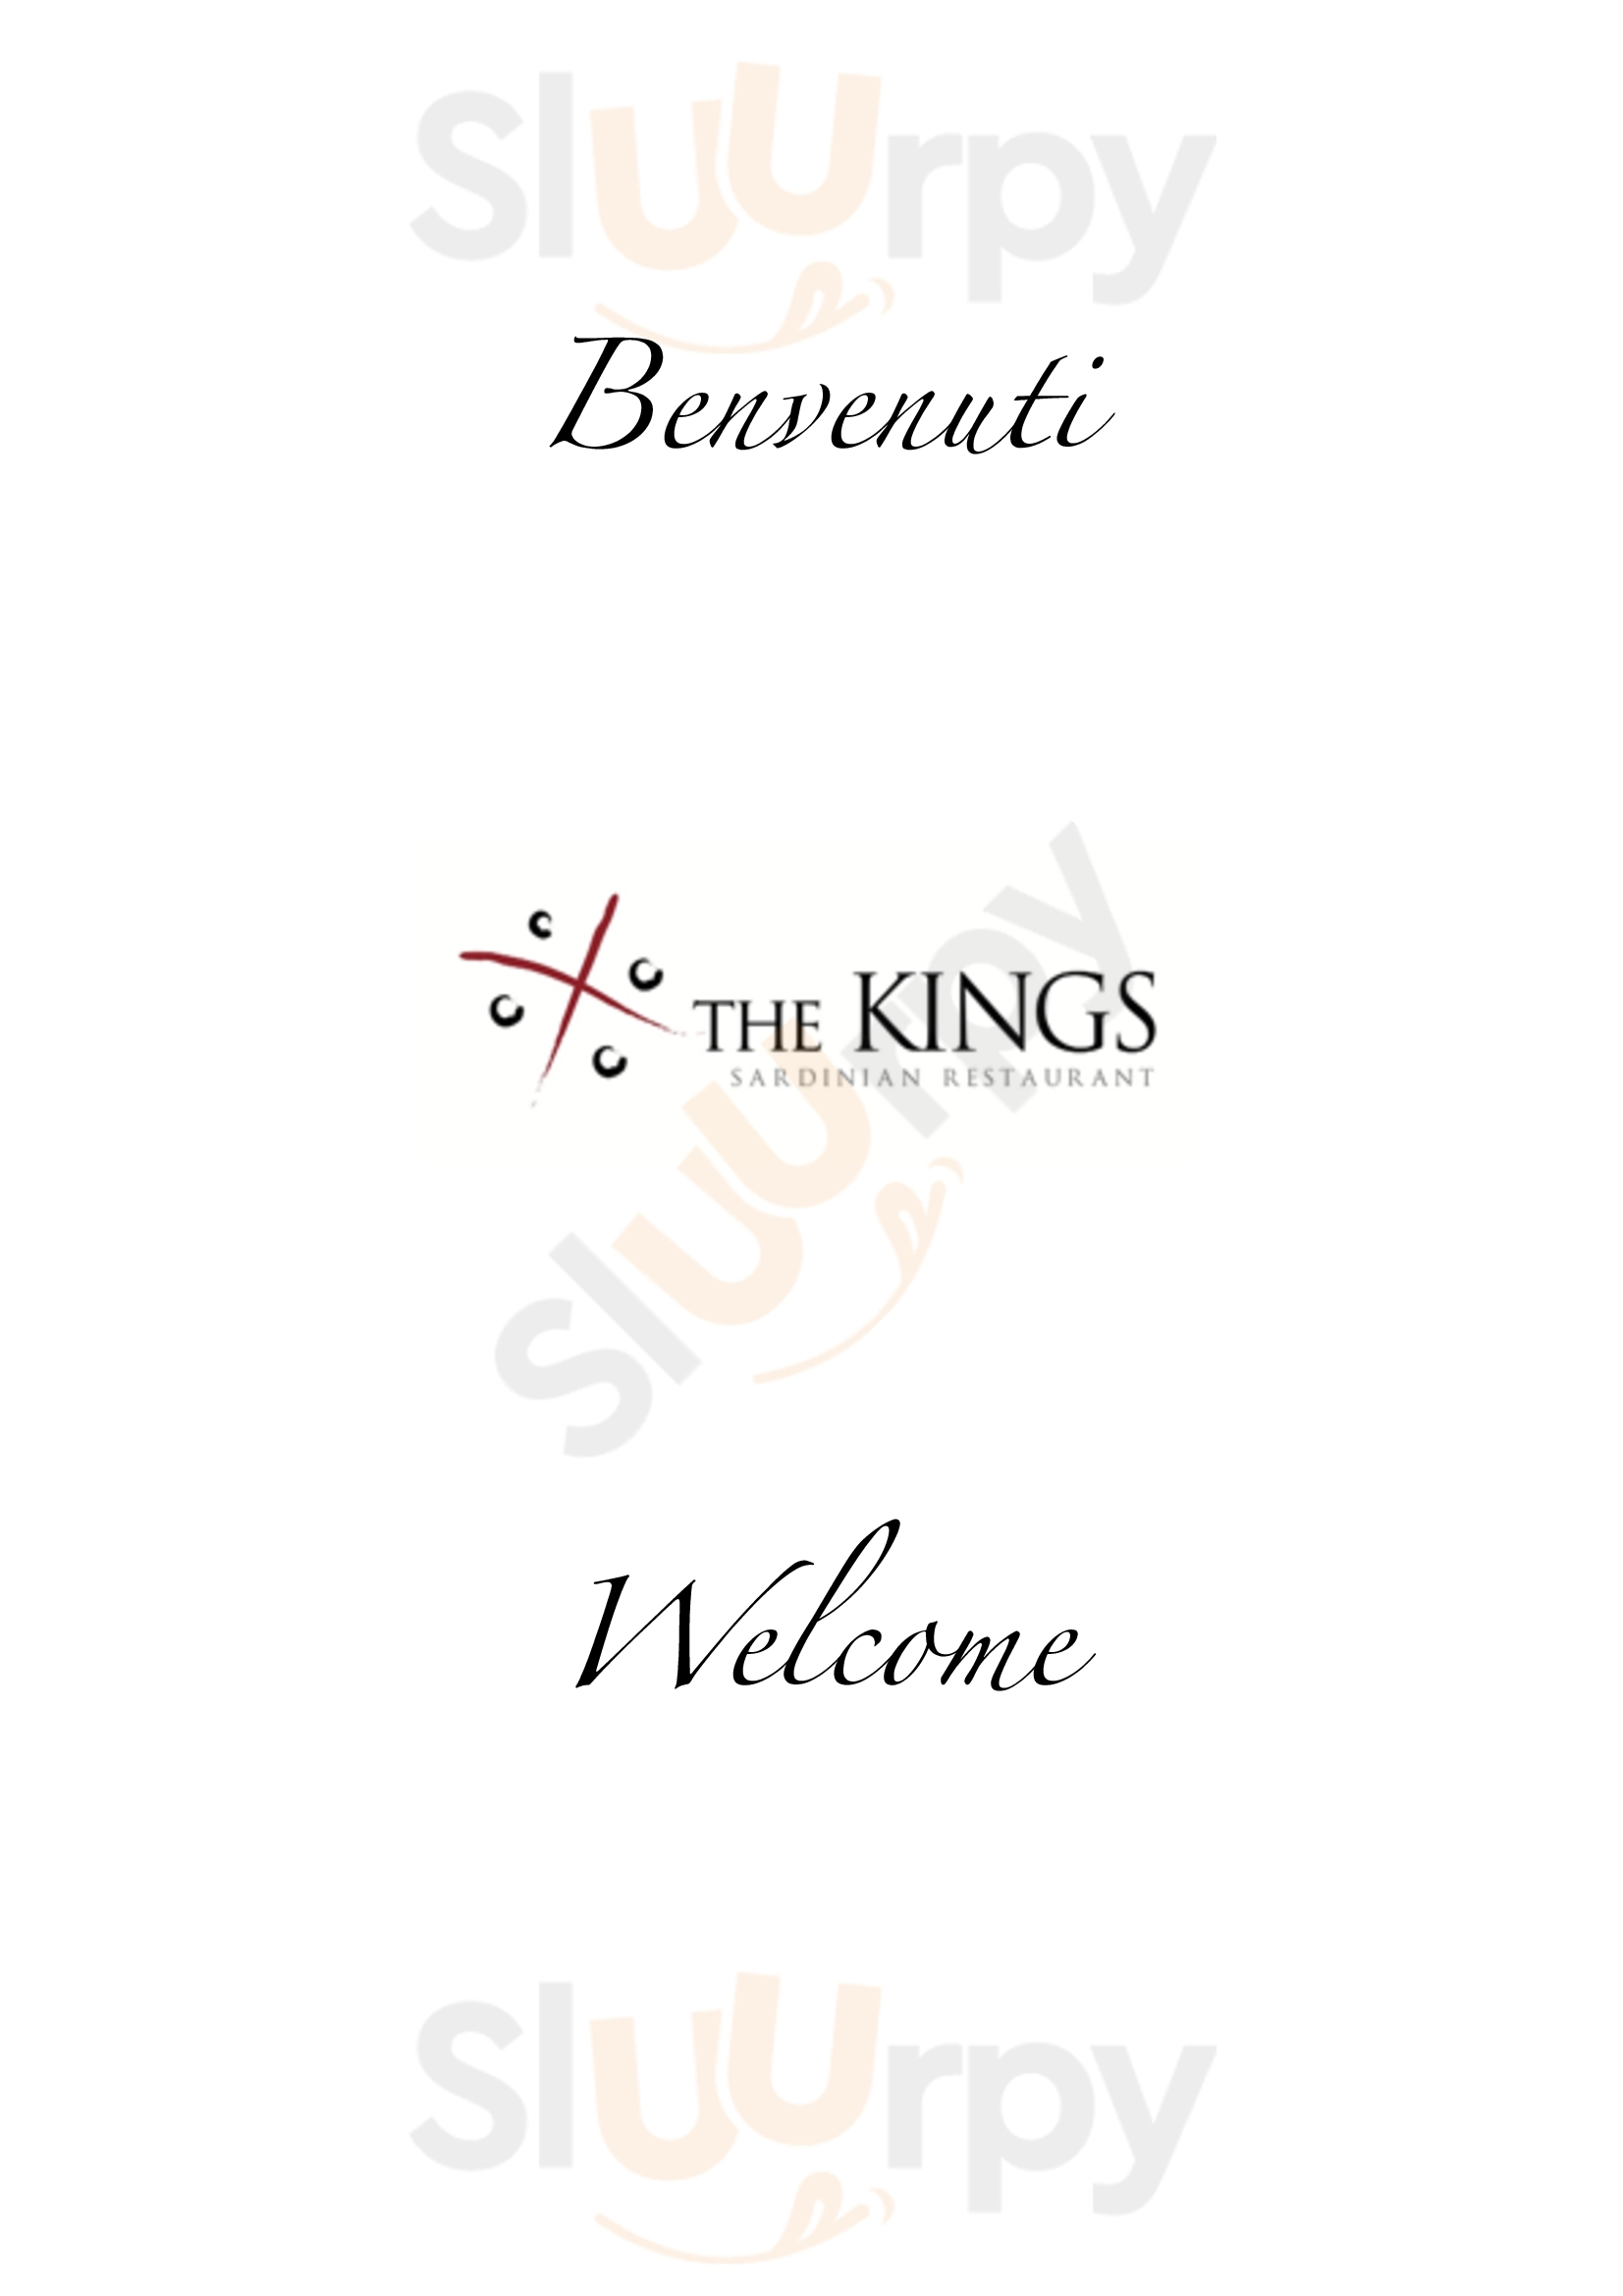 Ristorante Kings Alghero menù 1 pagina